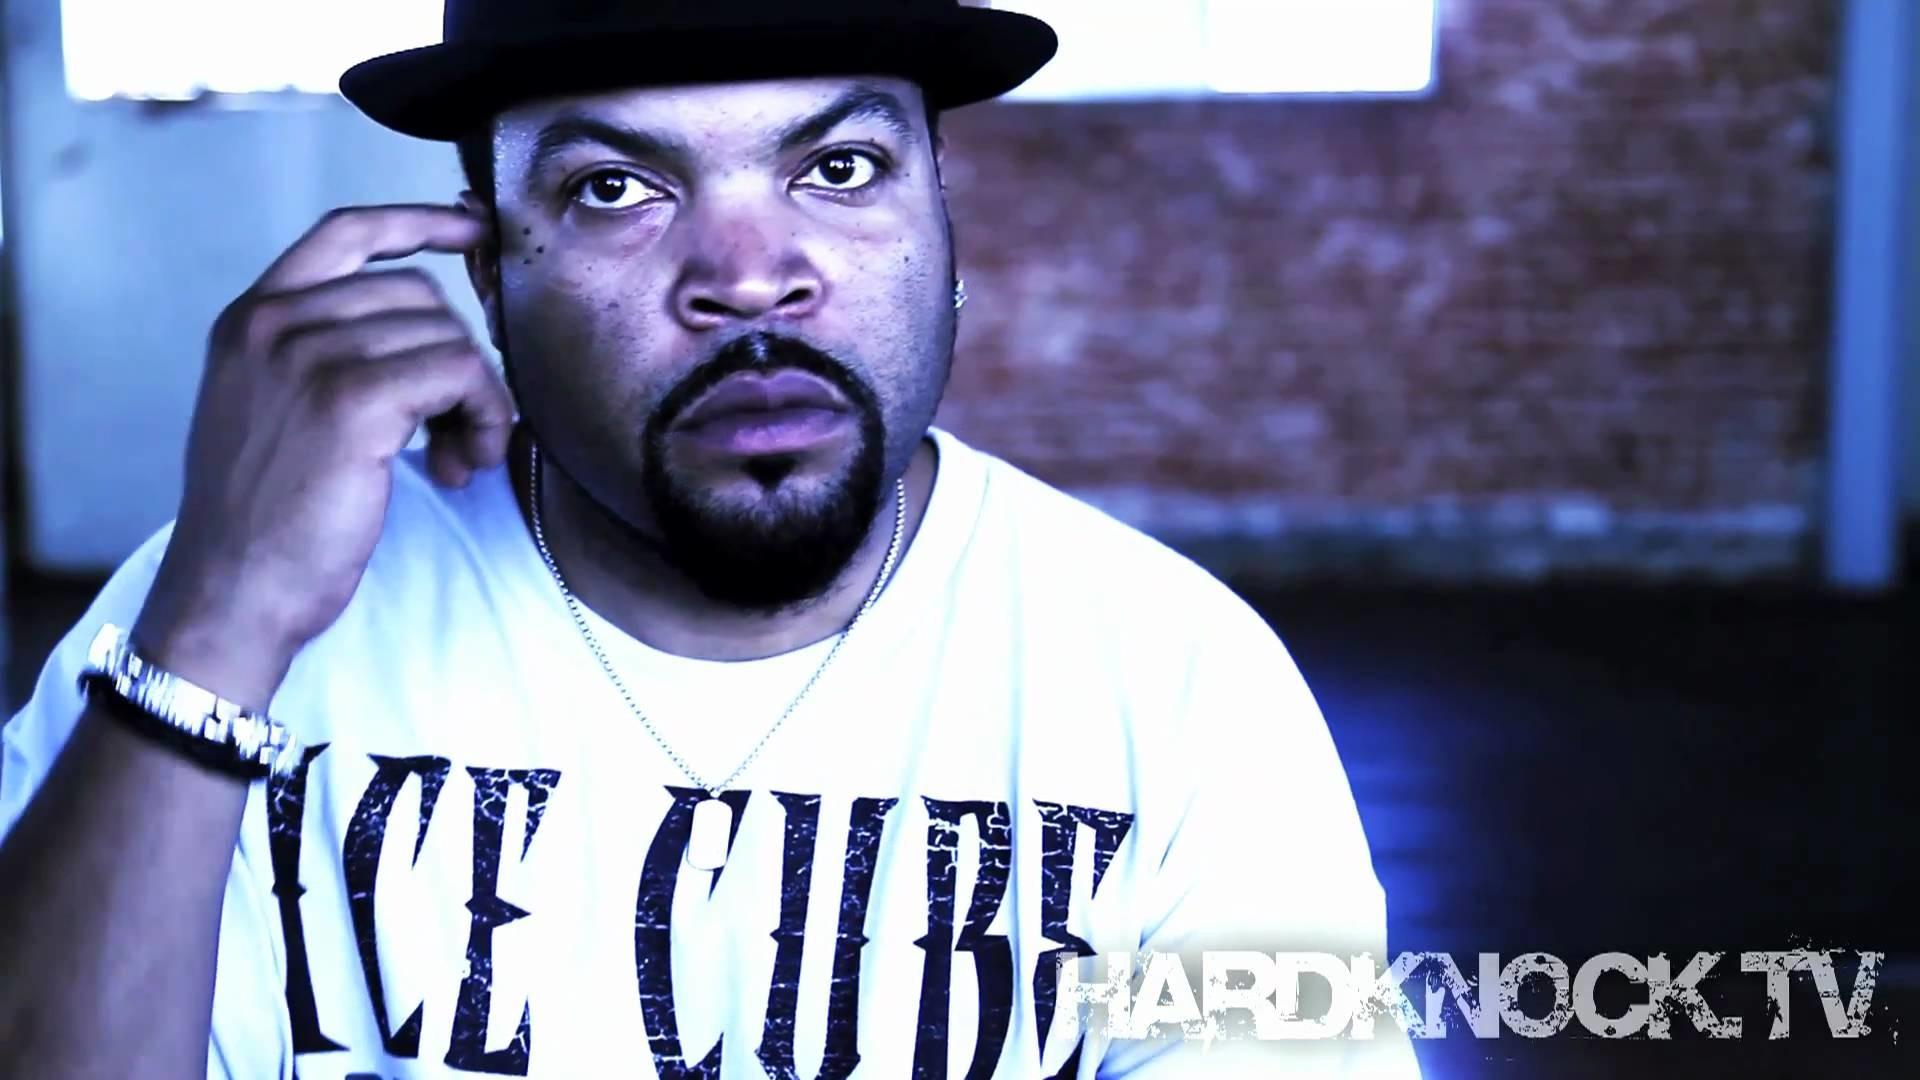 ICE CUBE gangsta rapper rap hip hop e wallpaper | .